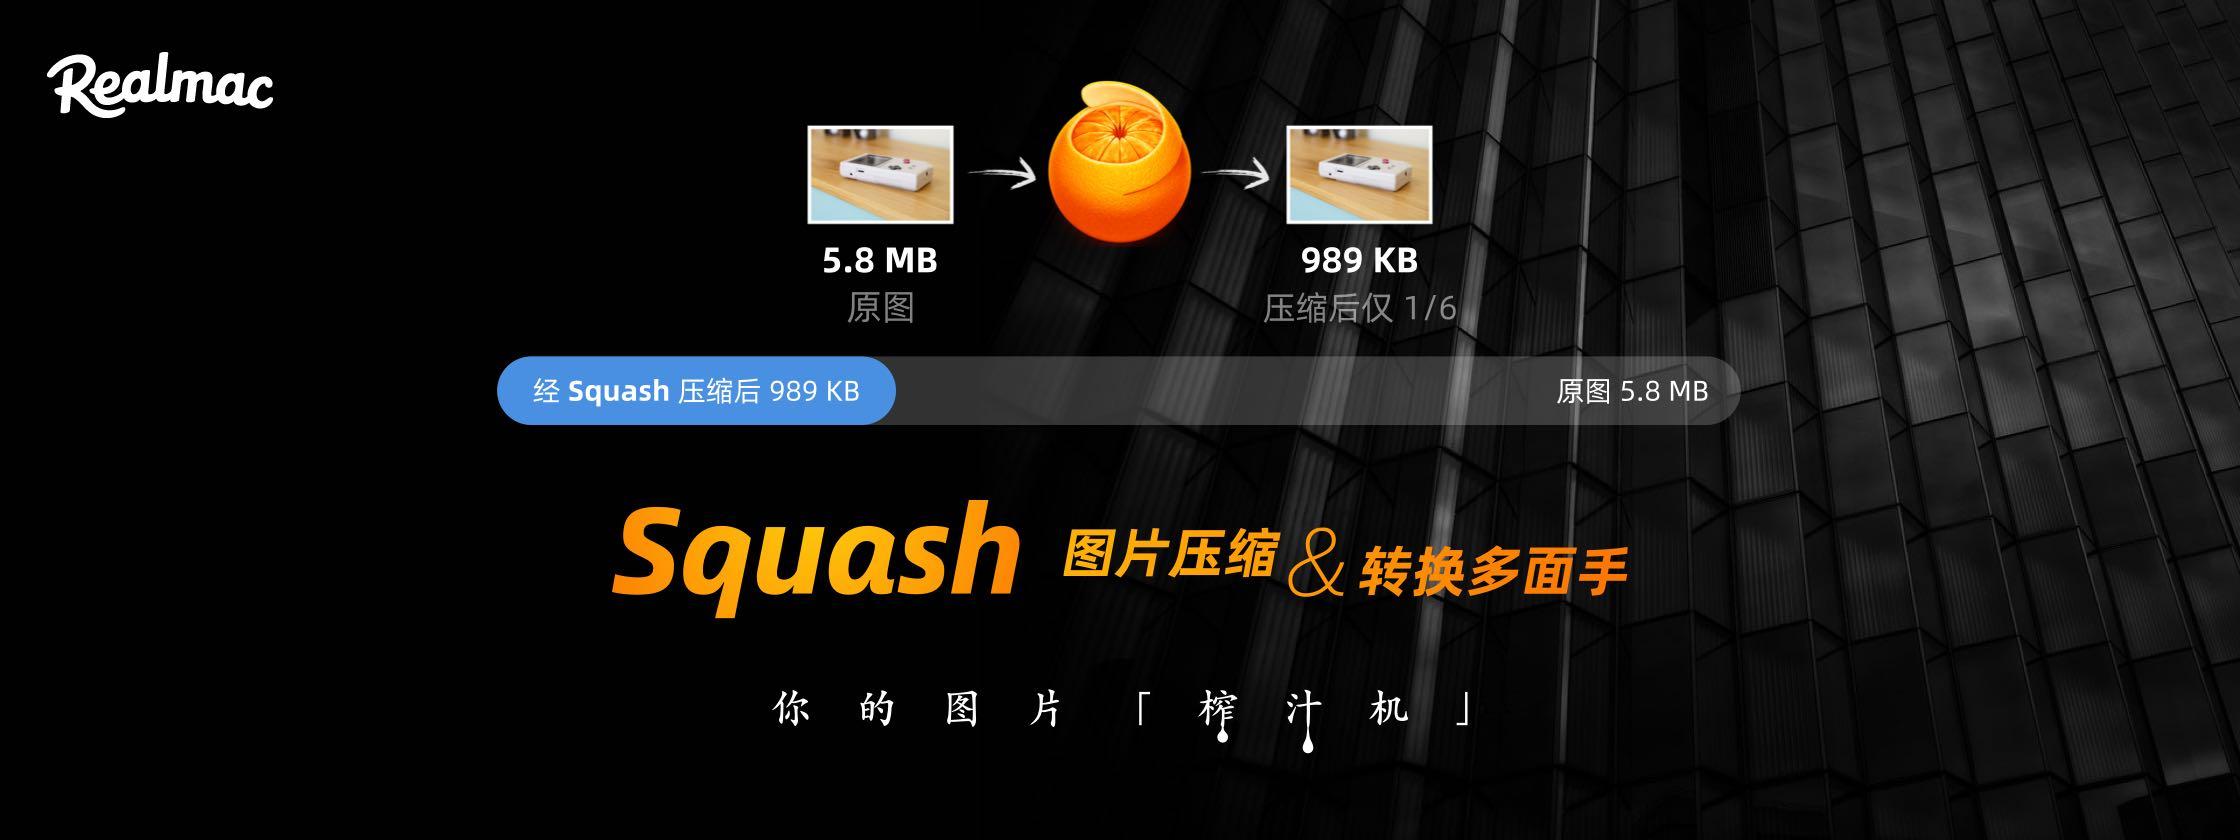 Squash – 图片压缩 & 转换多面手